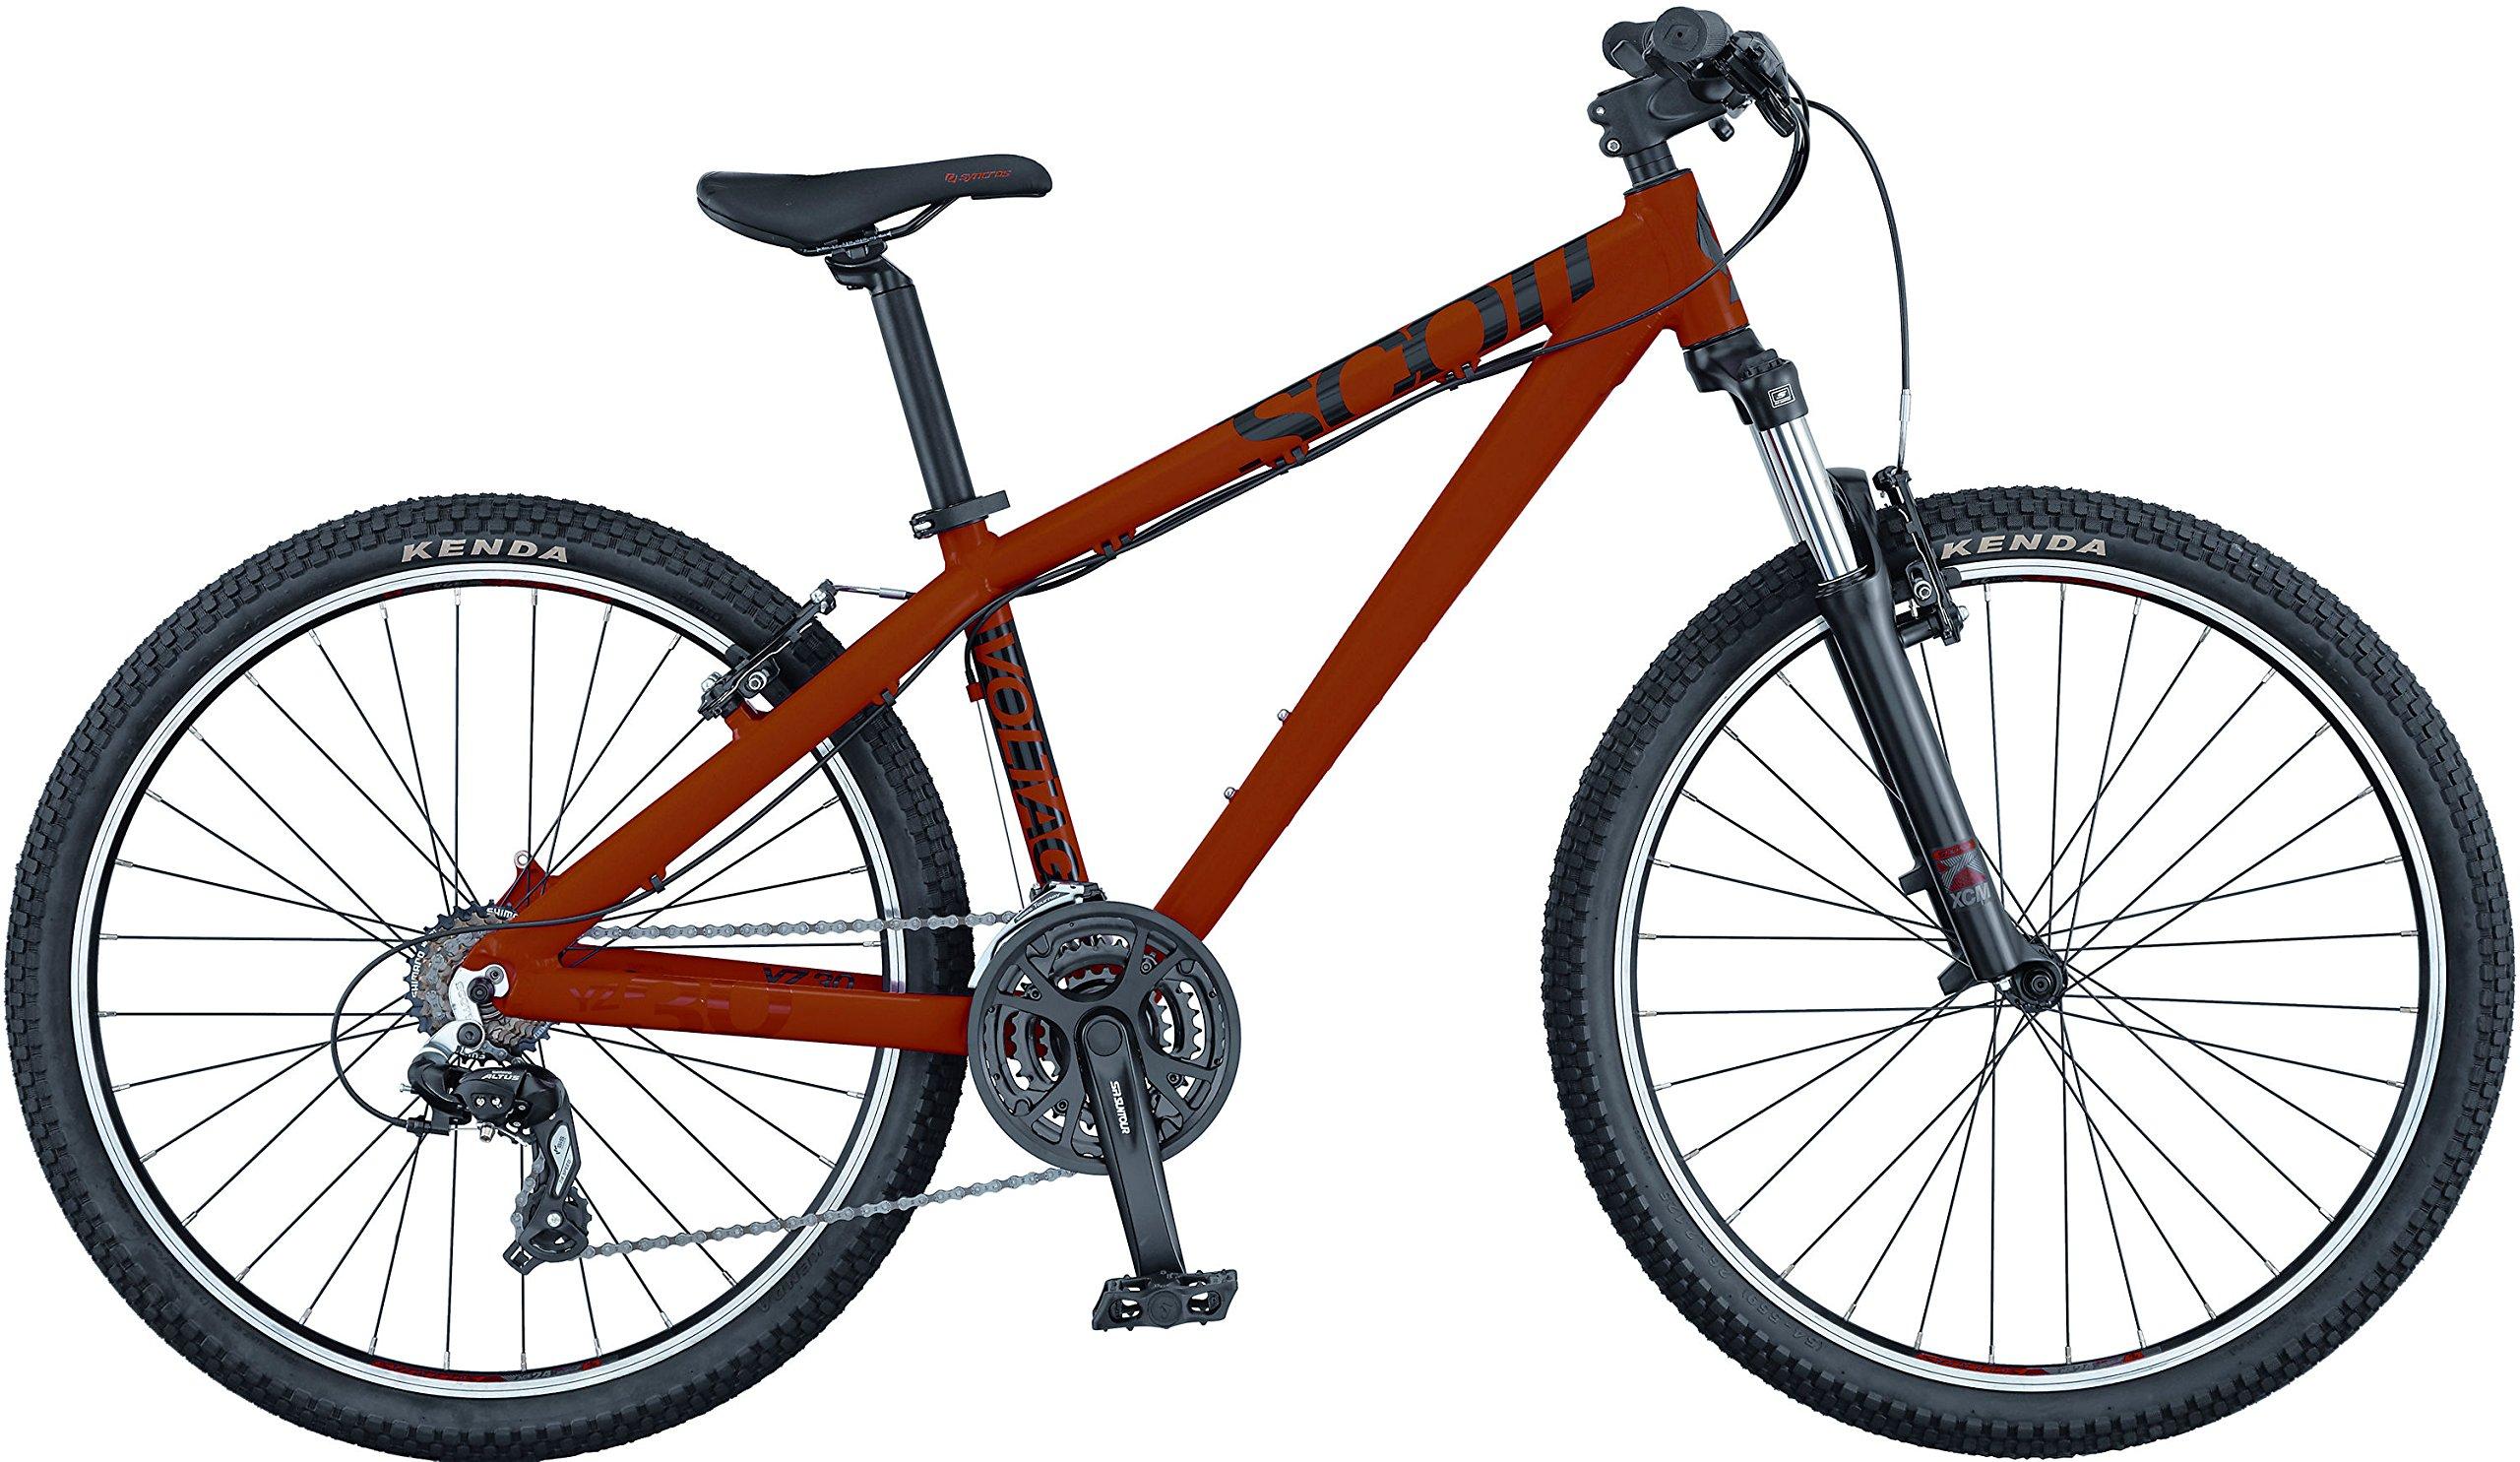 Scott Dirt Bike, rojo: Amazon.es: Deportes y aire libre